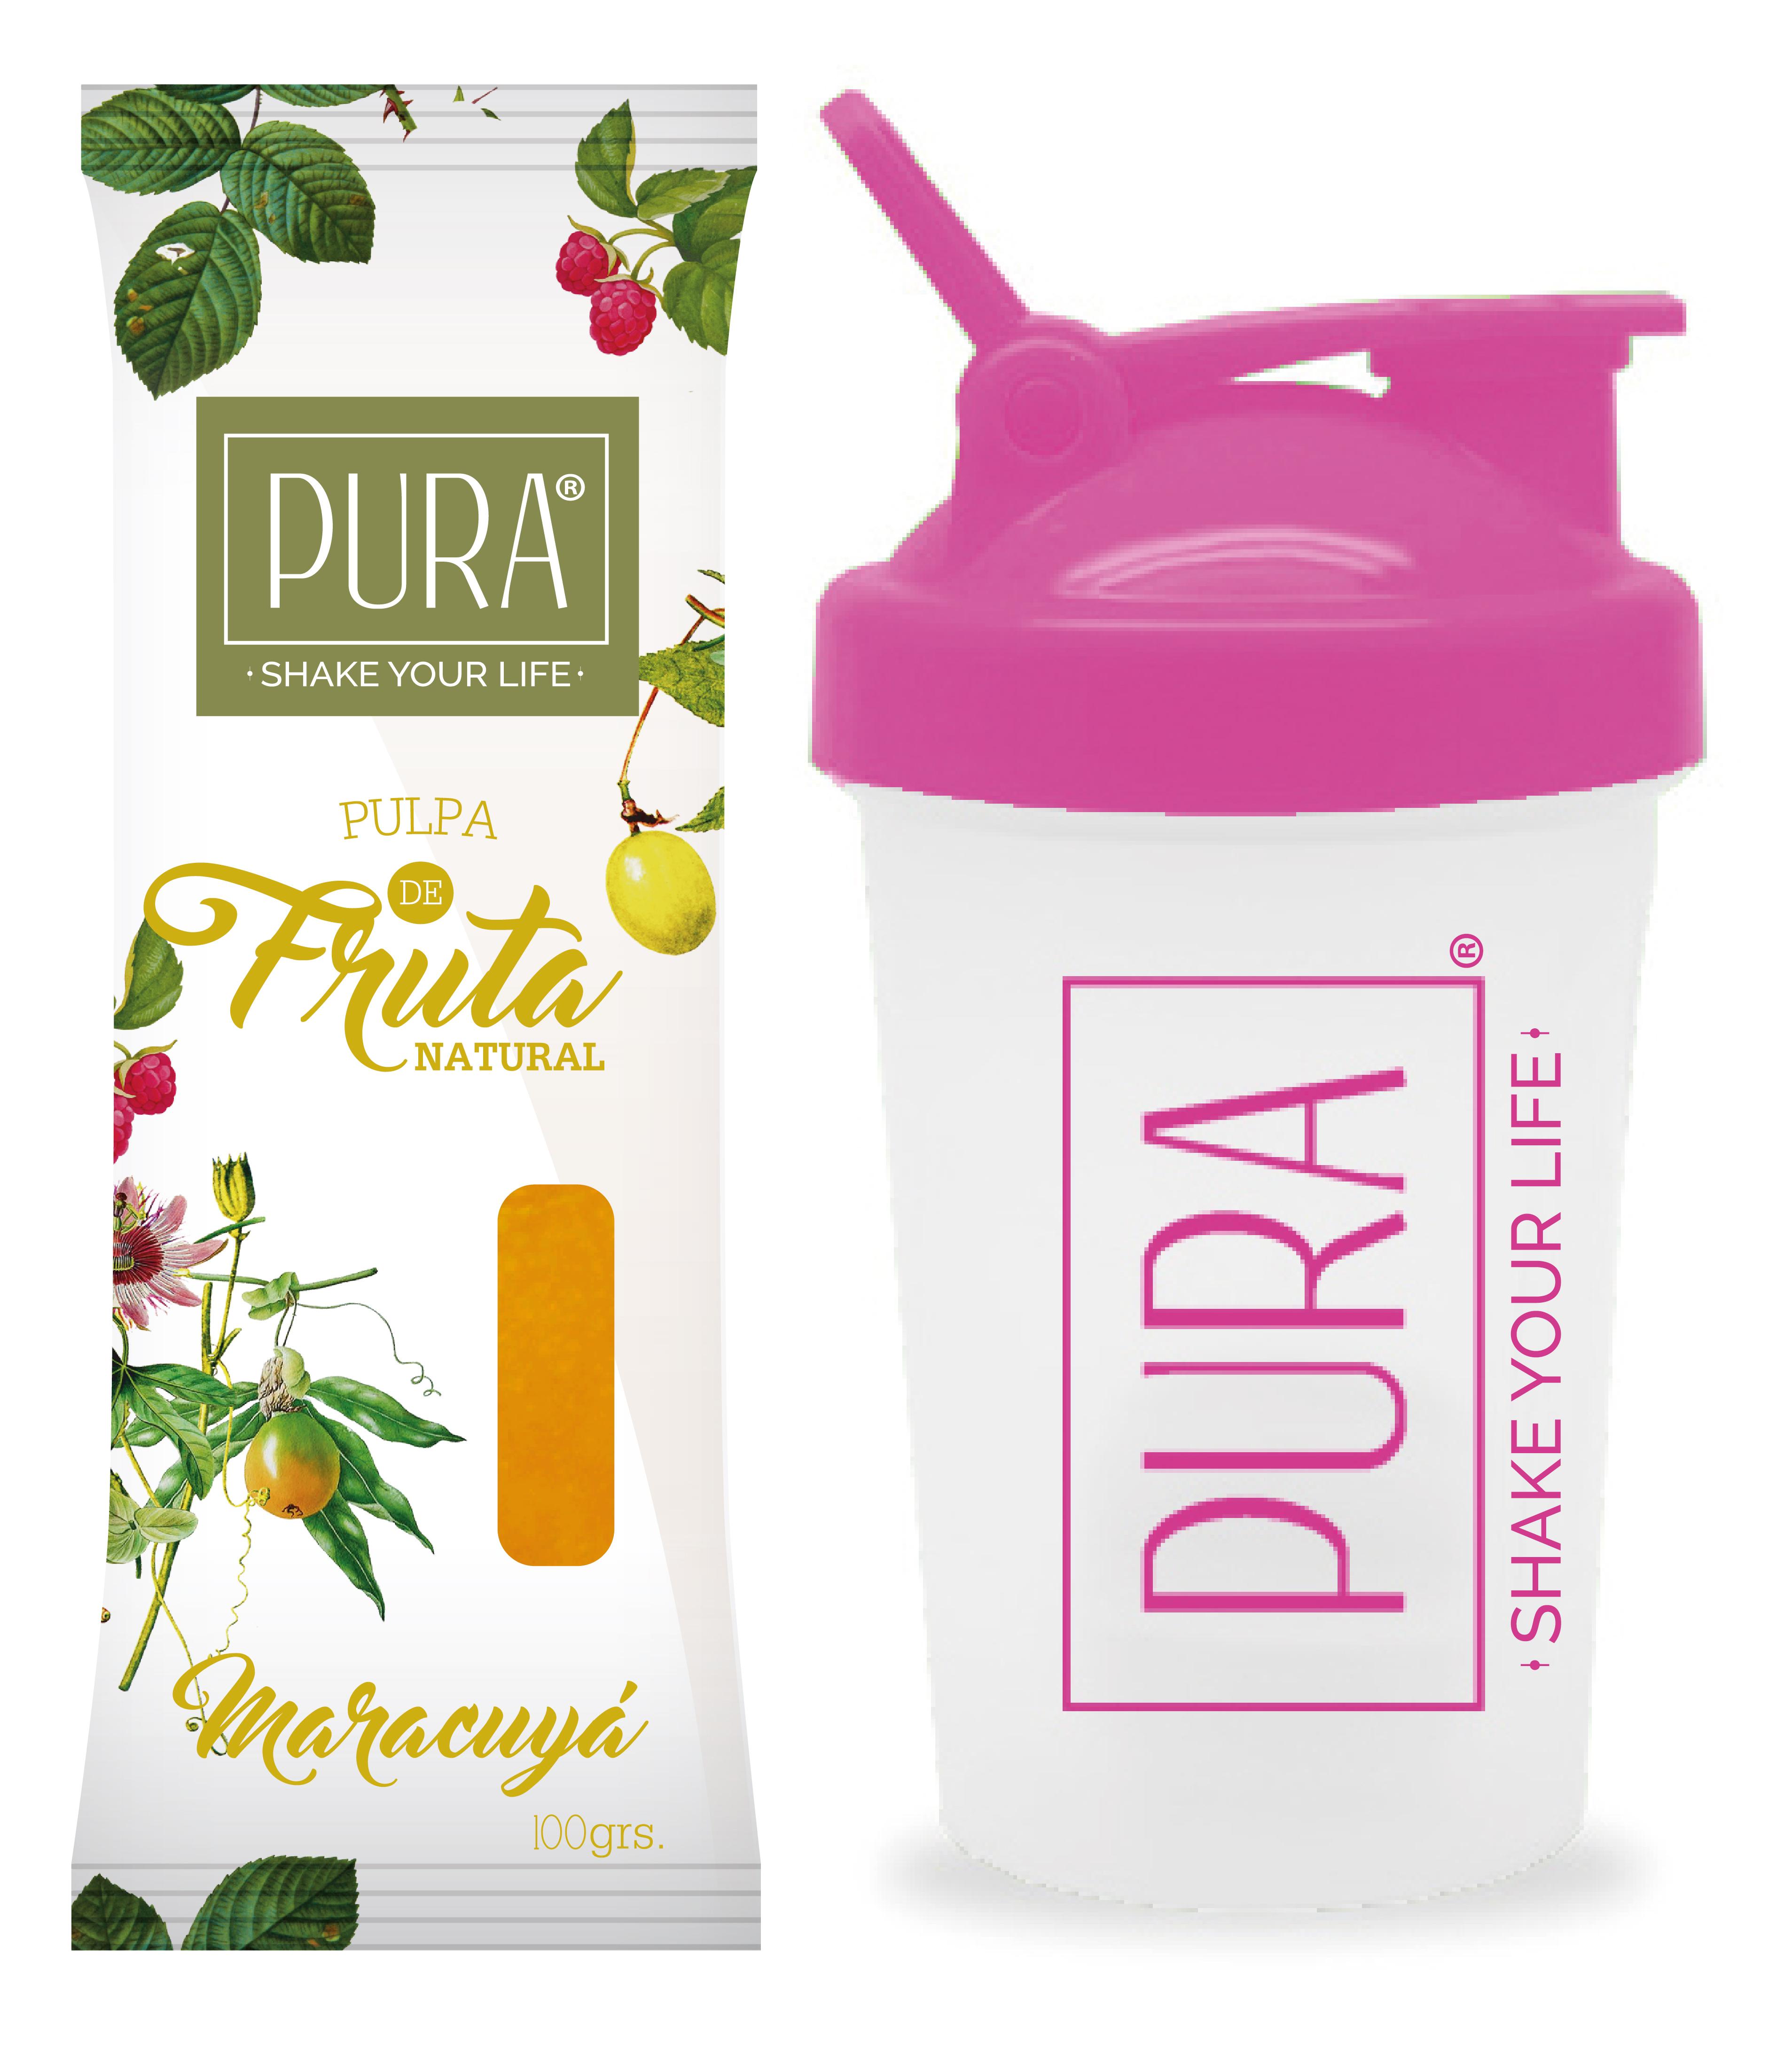 Galeria - Pura - Shake your life -